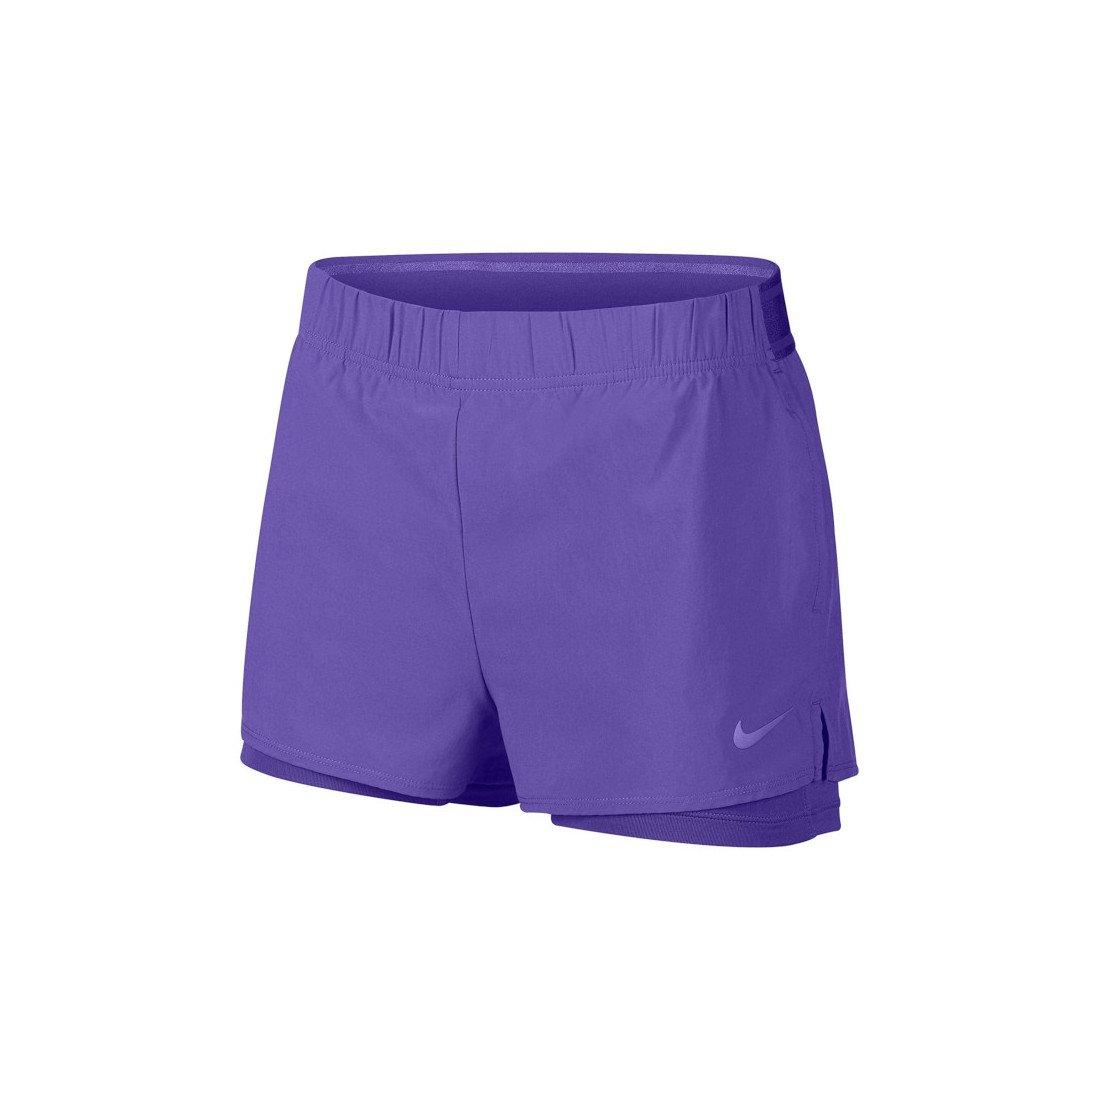 Nike Tennis Clothing – Women's Tennis Court Flex Short